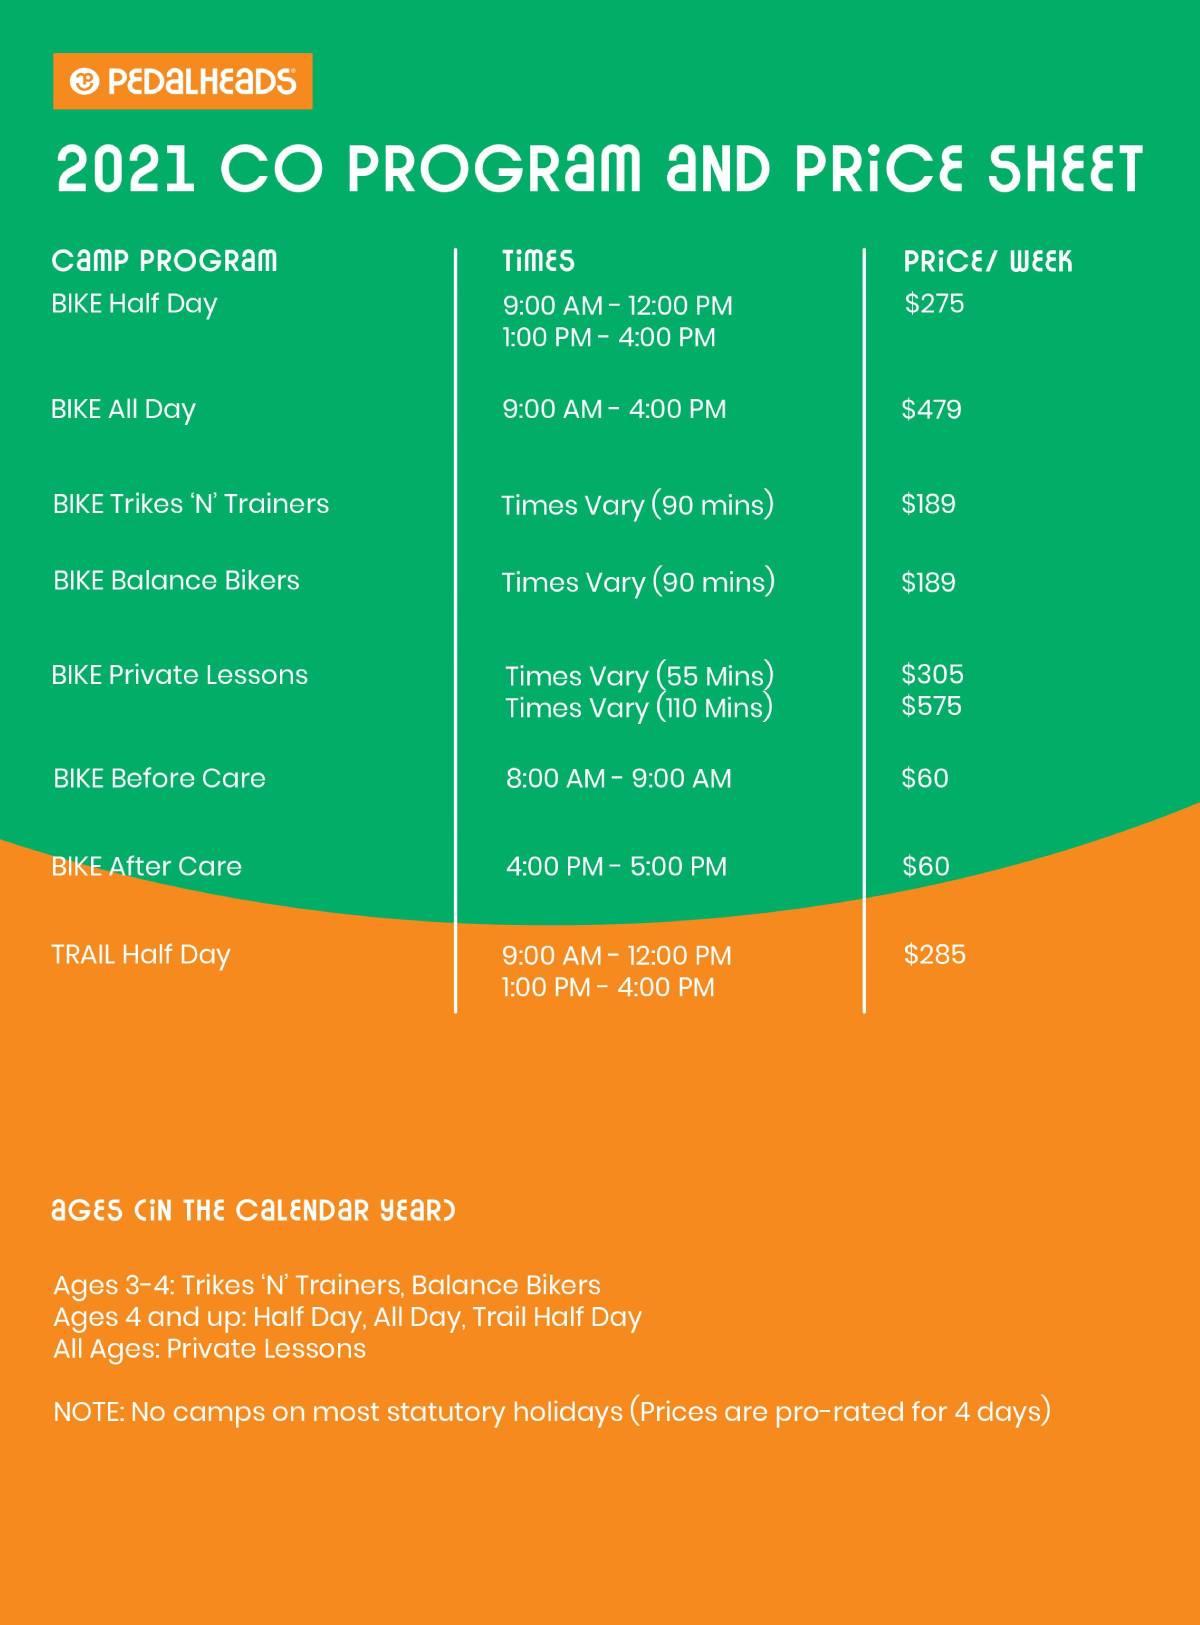 Colorado Price Sheet